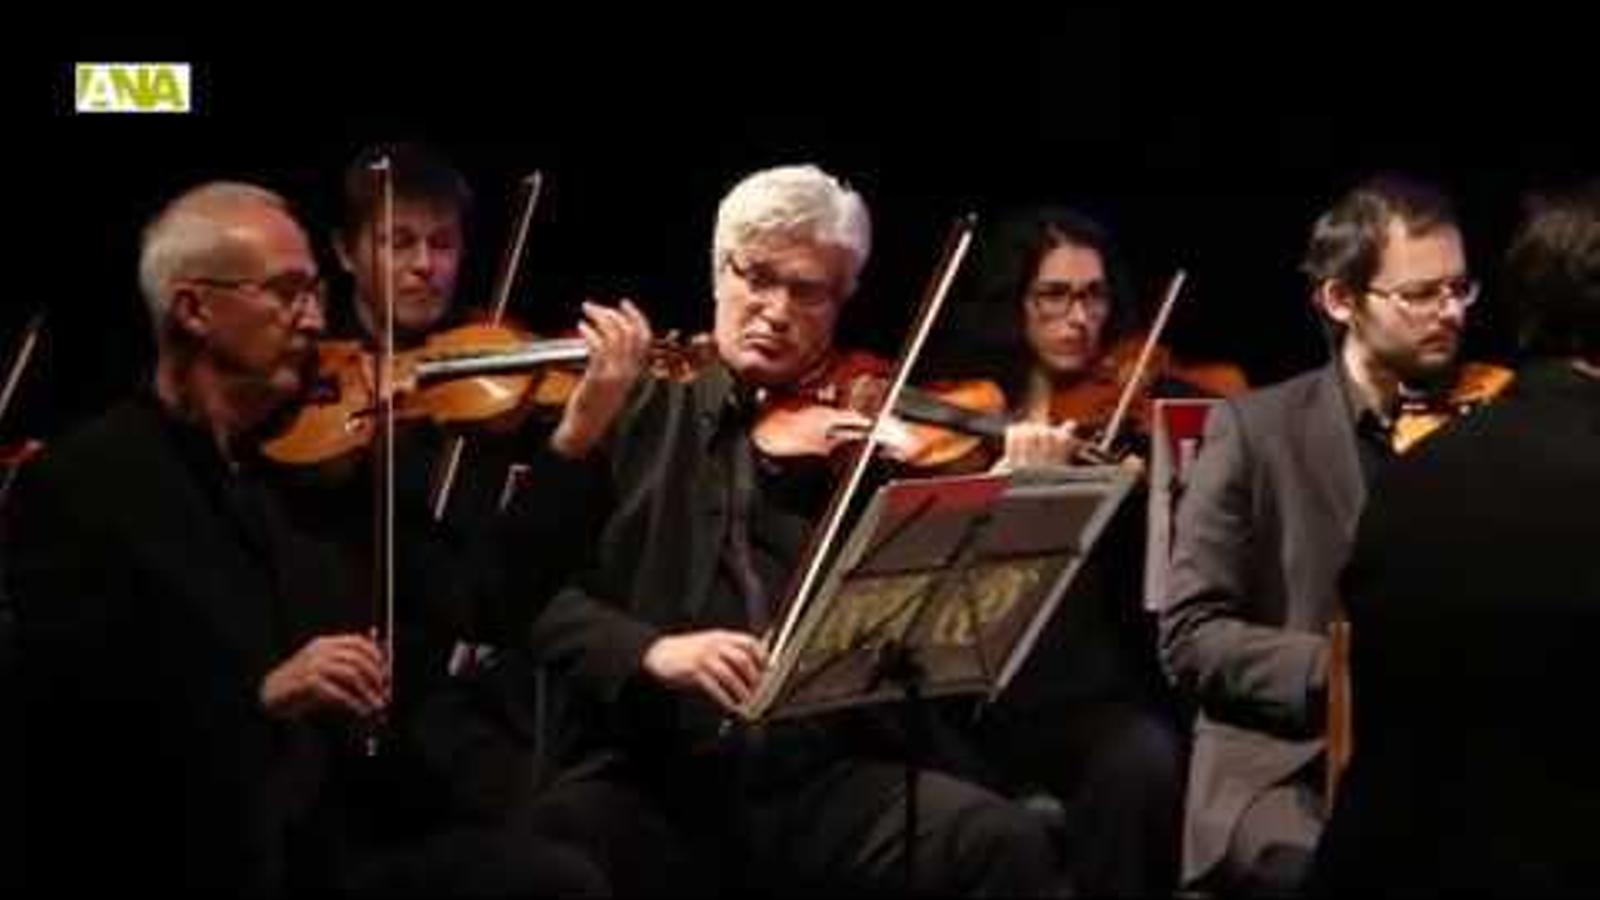 Segon concert del Cicle Paisatges.